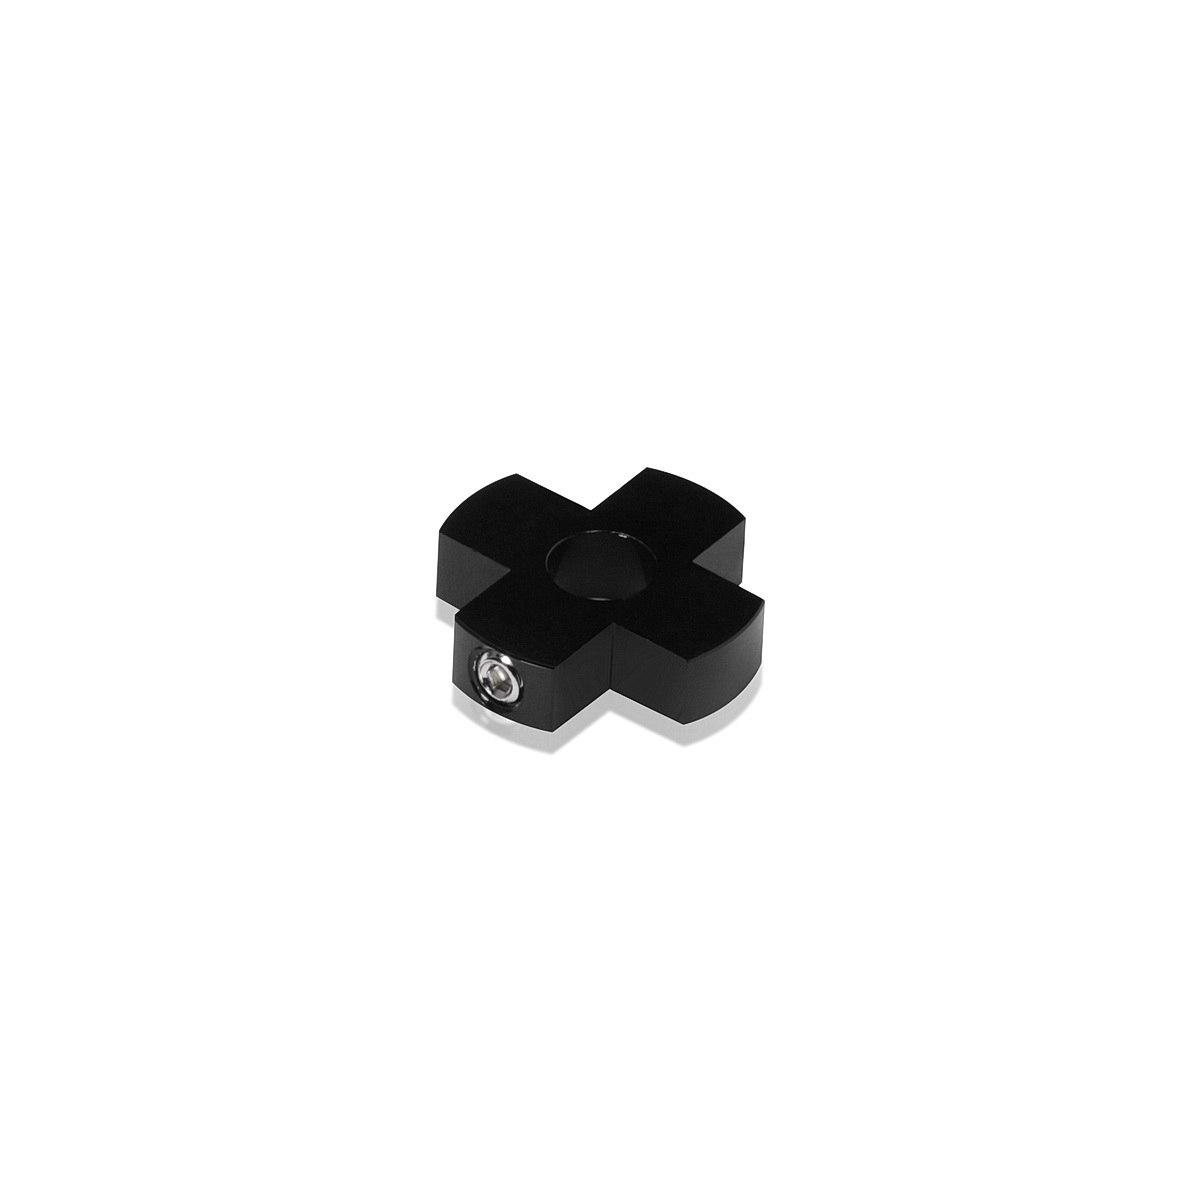 4-Way Standoffs Hub, Diameter: 1'', Thickness: 1/4'', Black Anodized Aluminum